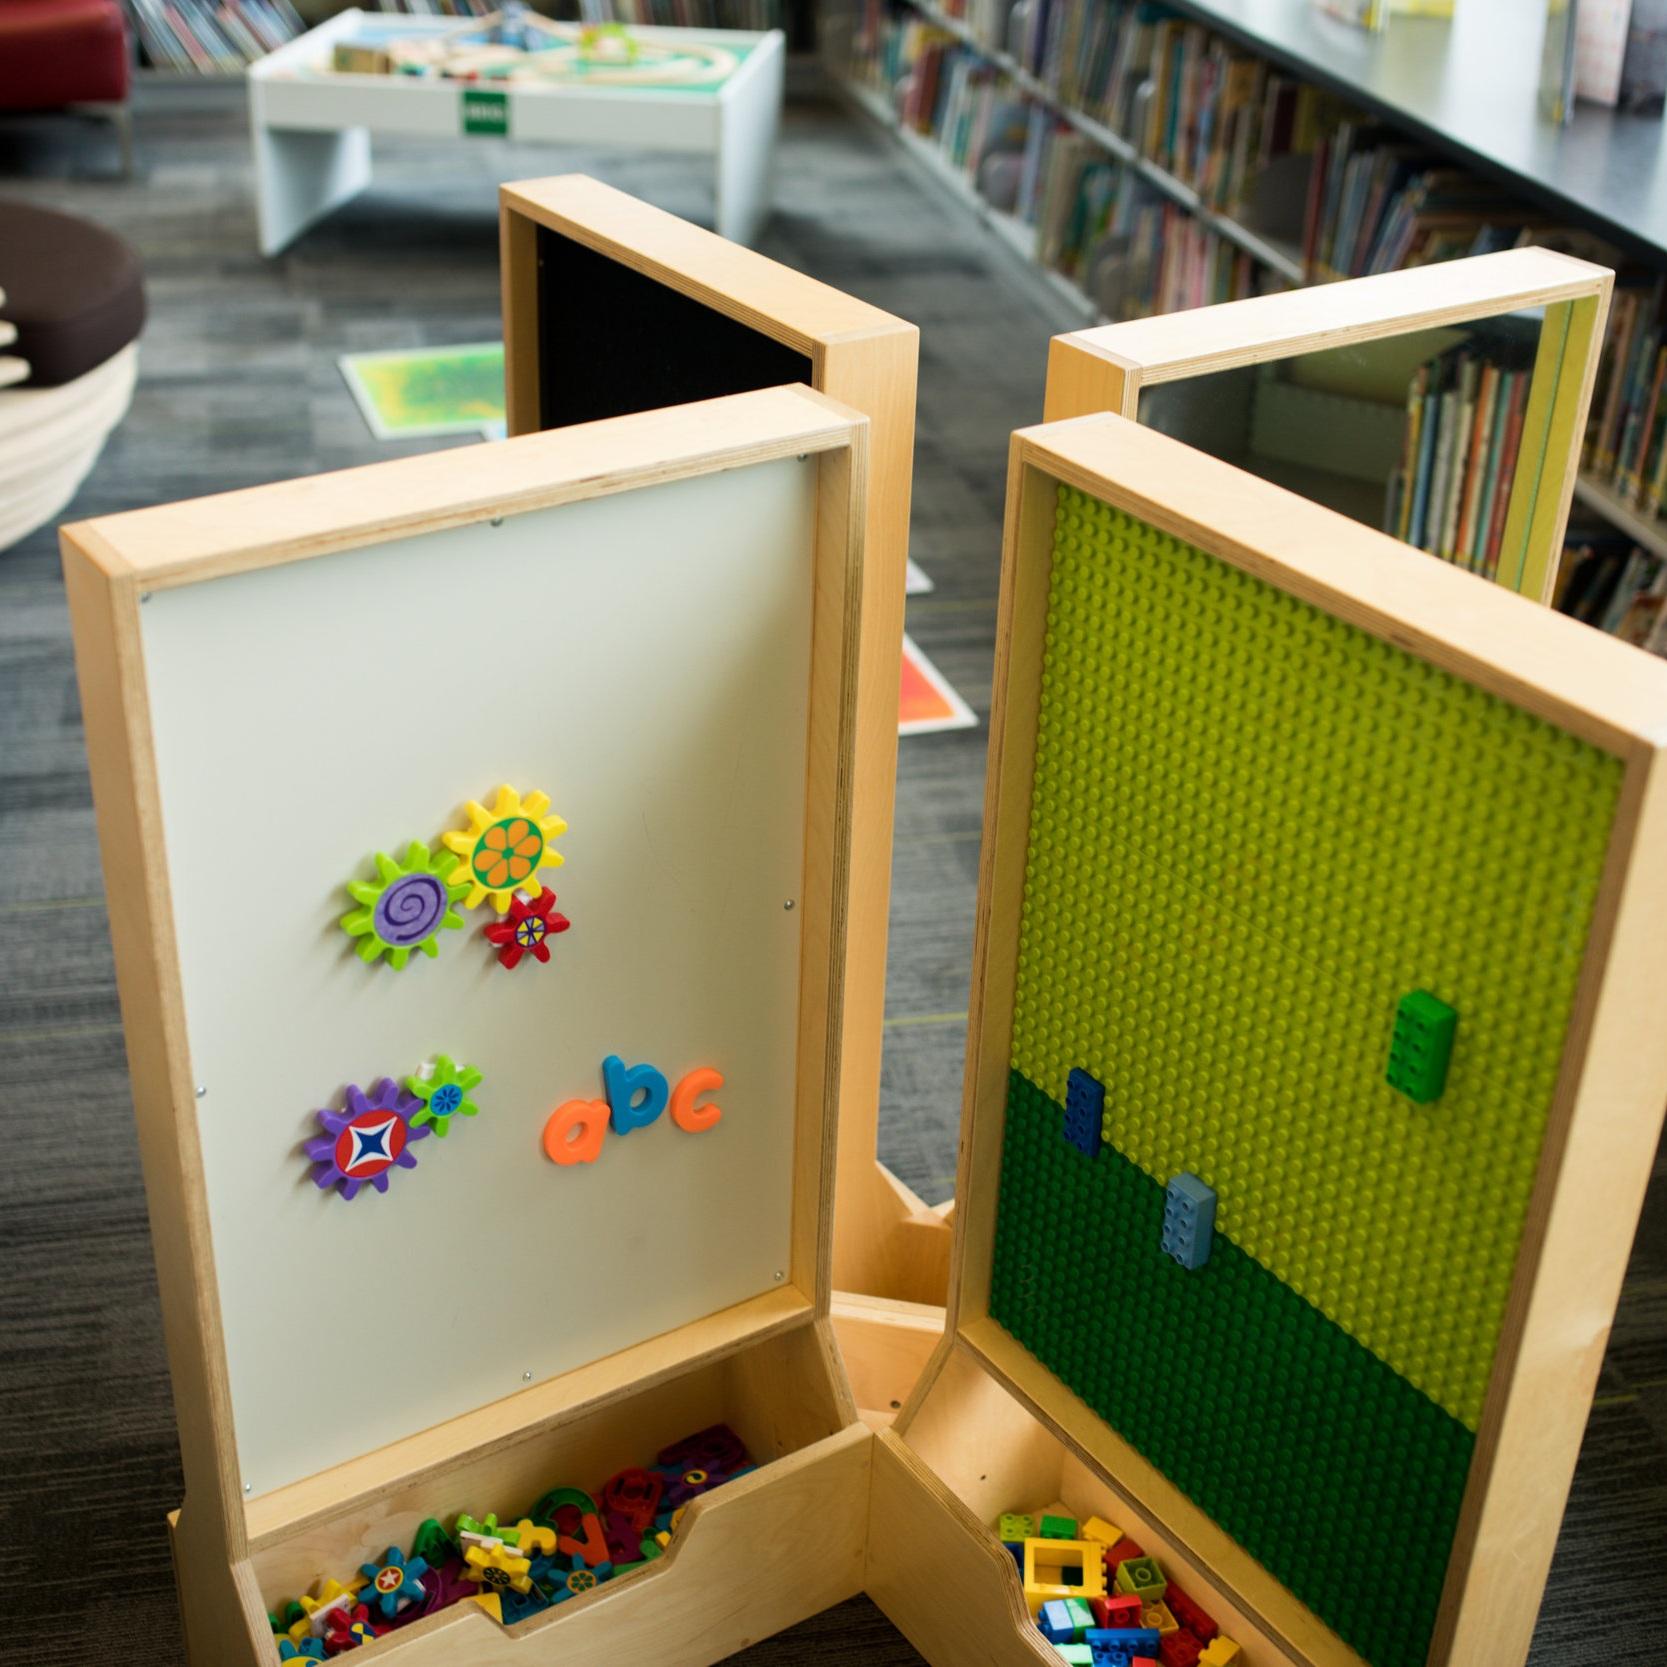 8-panel play station -